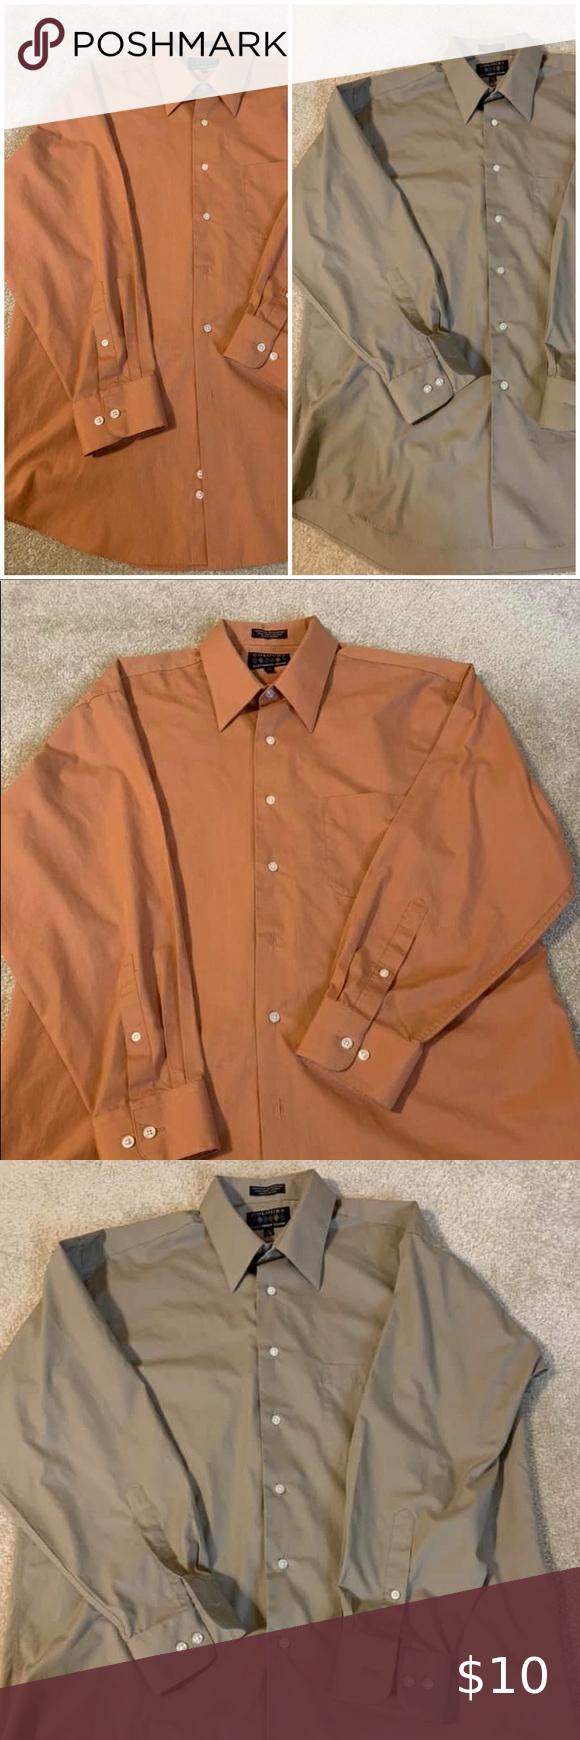 Bundle Of Two Men S Dress Shirts Shirts Shirt Dress Mens Shirt Dress [ 1740 x 580 Pixel ]